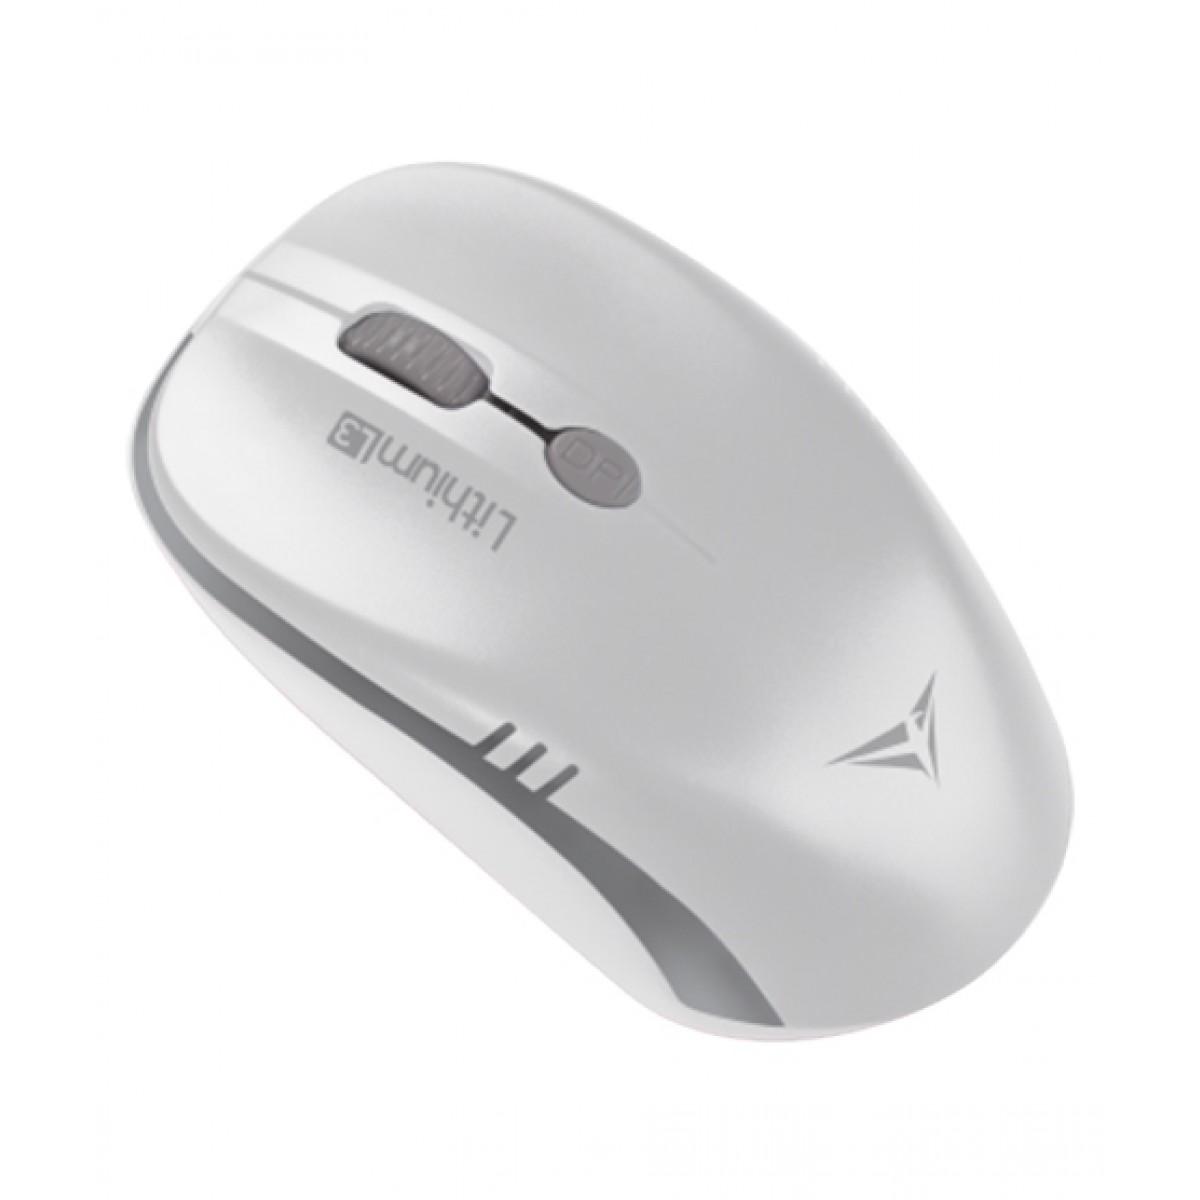 Alcatroz Lithium L3 Wireless Mouse White/Grey